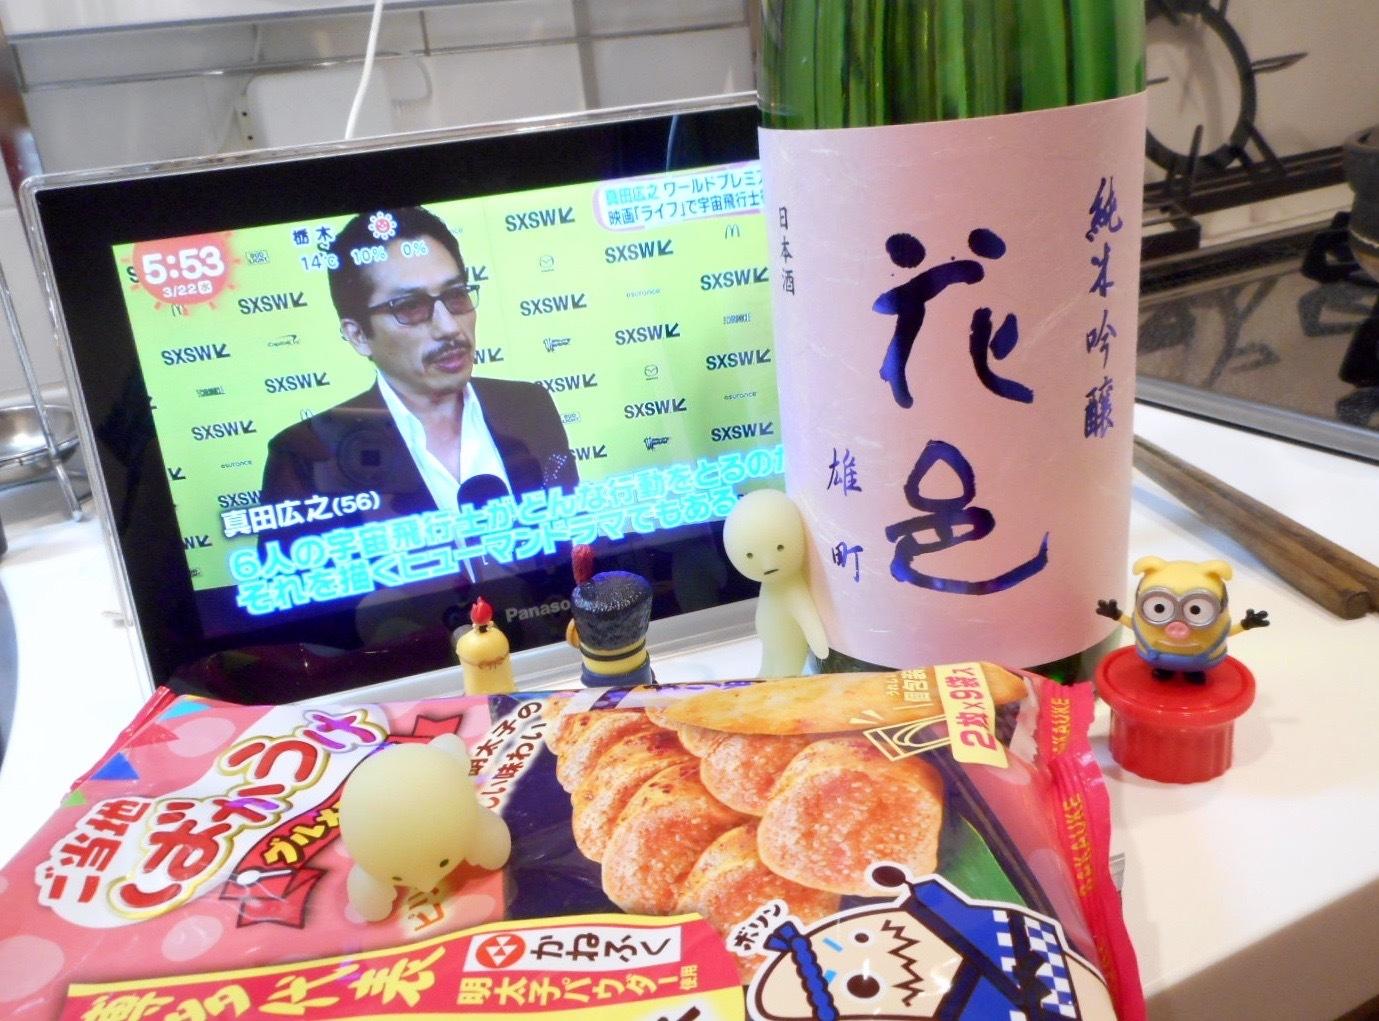 hanamura_omachi_nama28by1.jpg